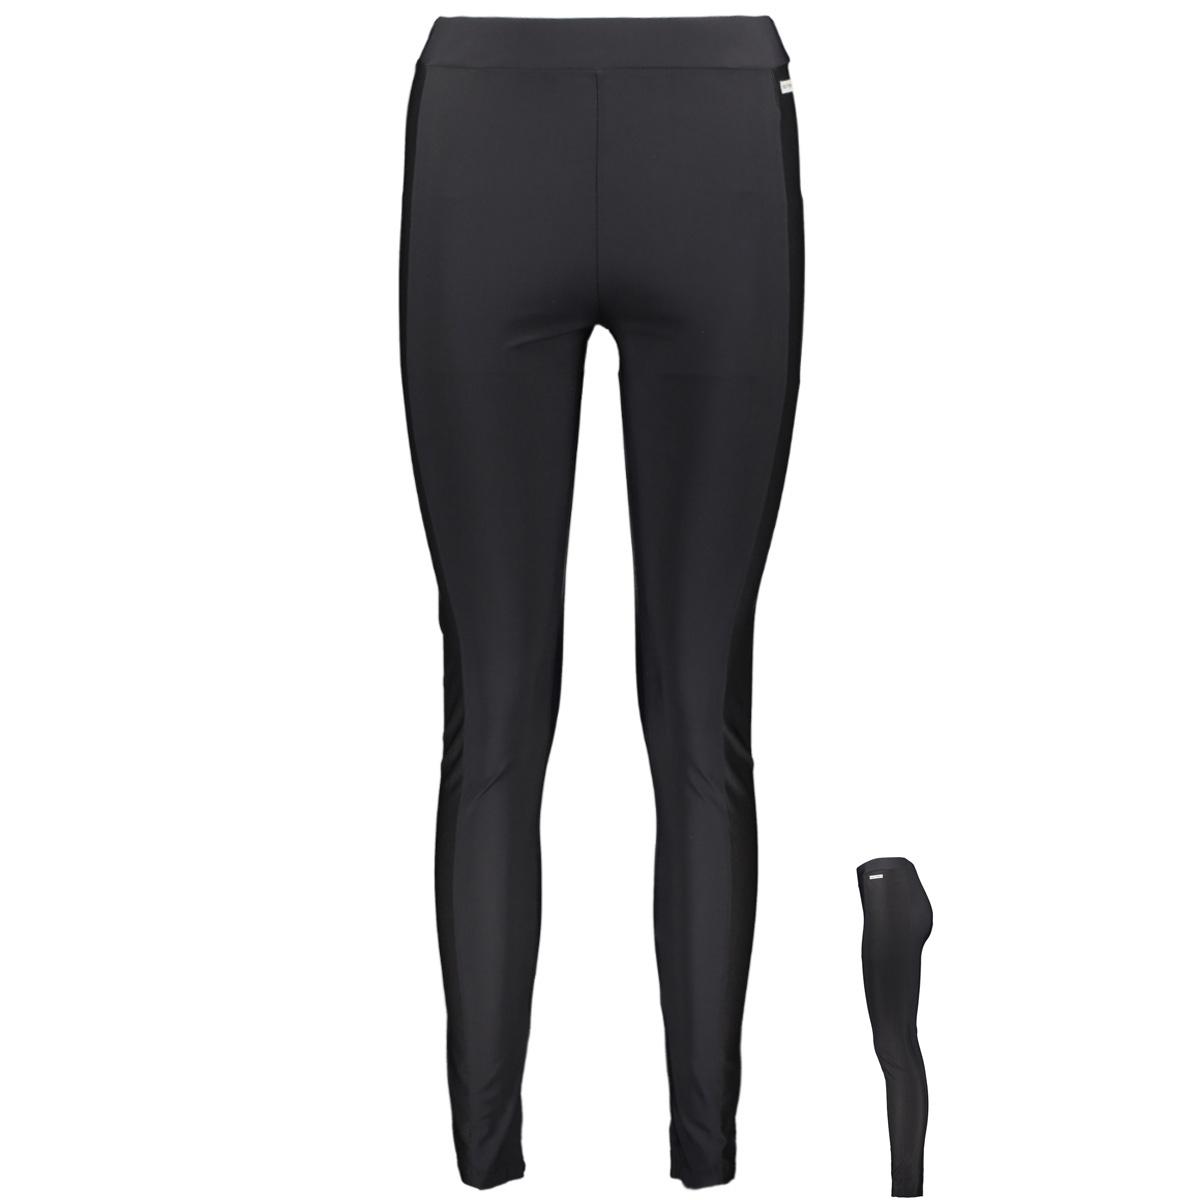 dare 194 travel tight pant zoso legging black